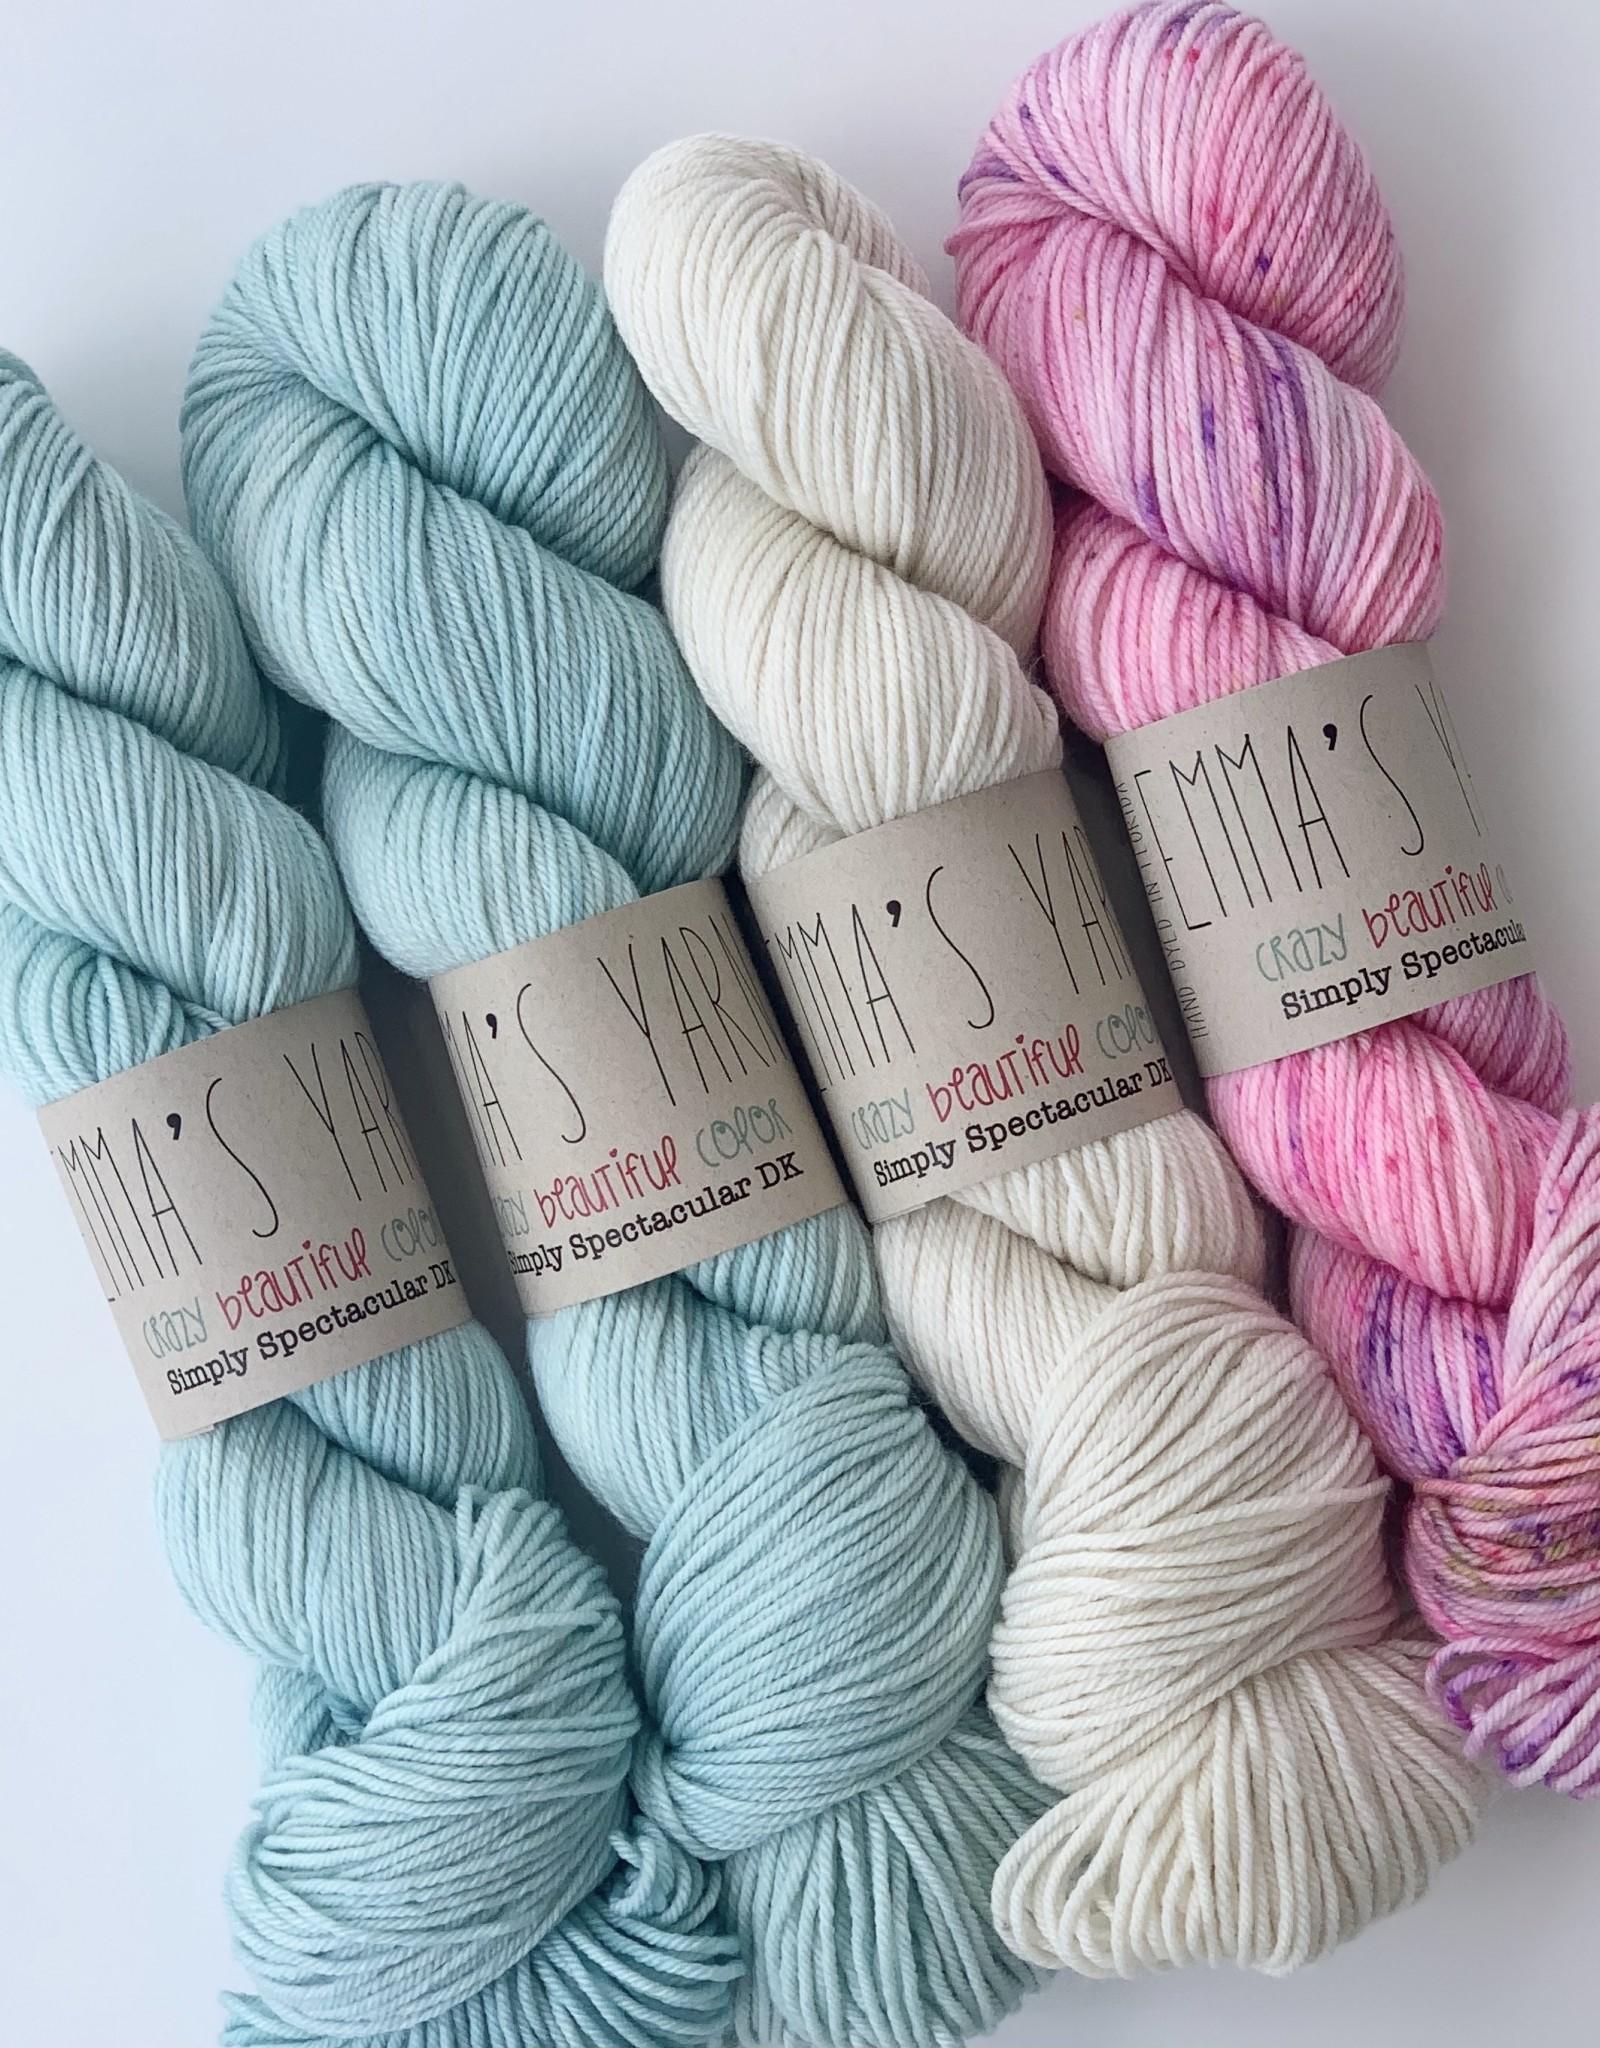 Emma's Yarn Noncho Kit - PRESALE